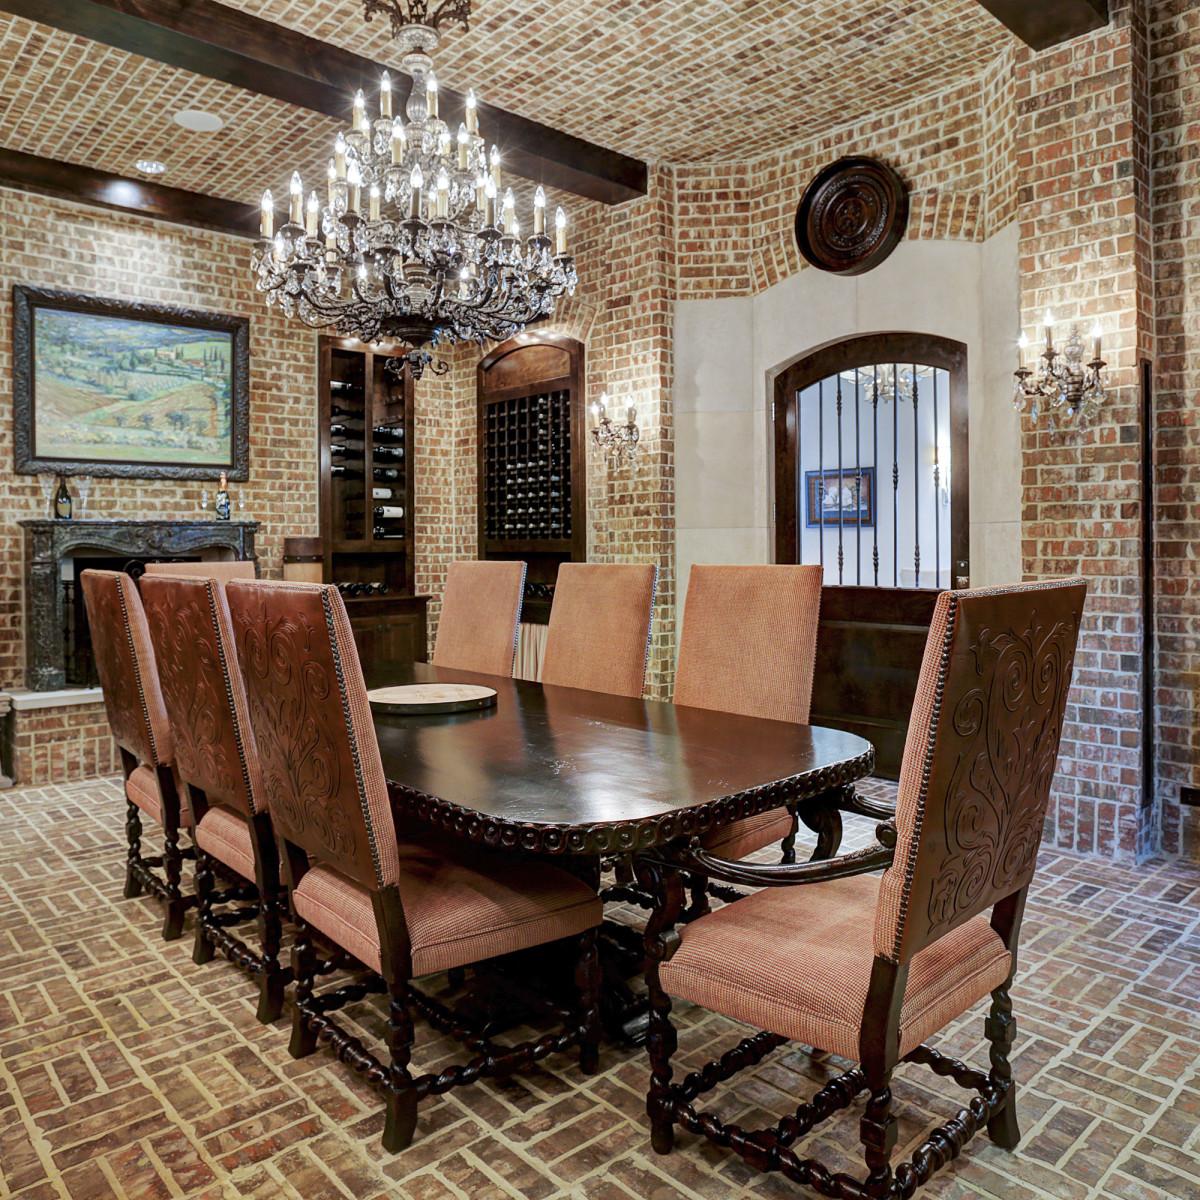 Houston, Buckingham 527, June 2015, wine room 2